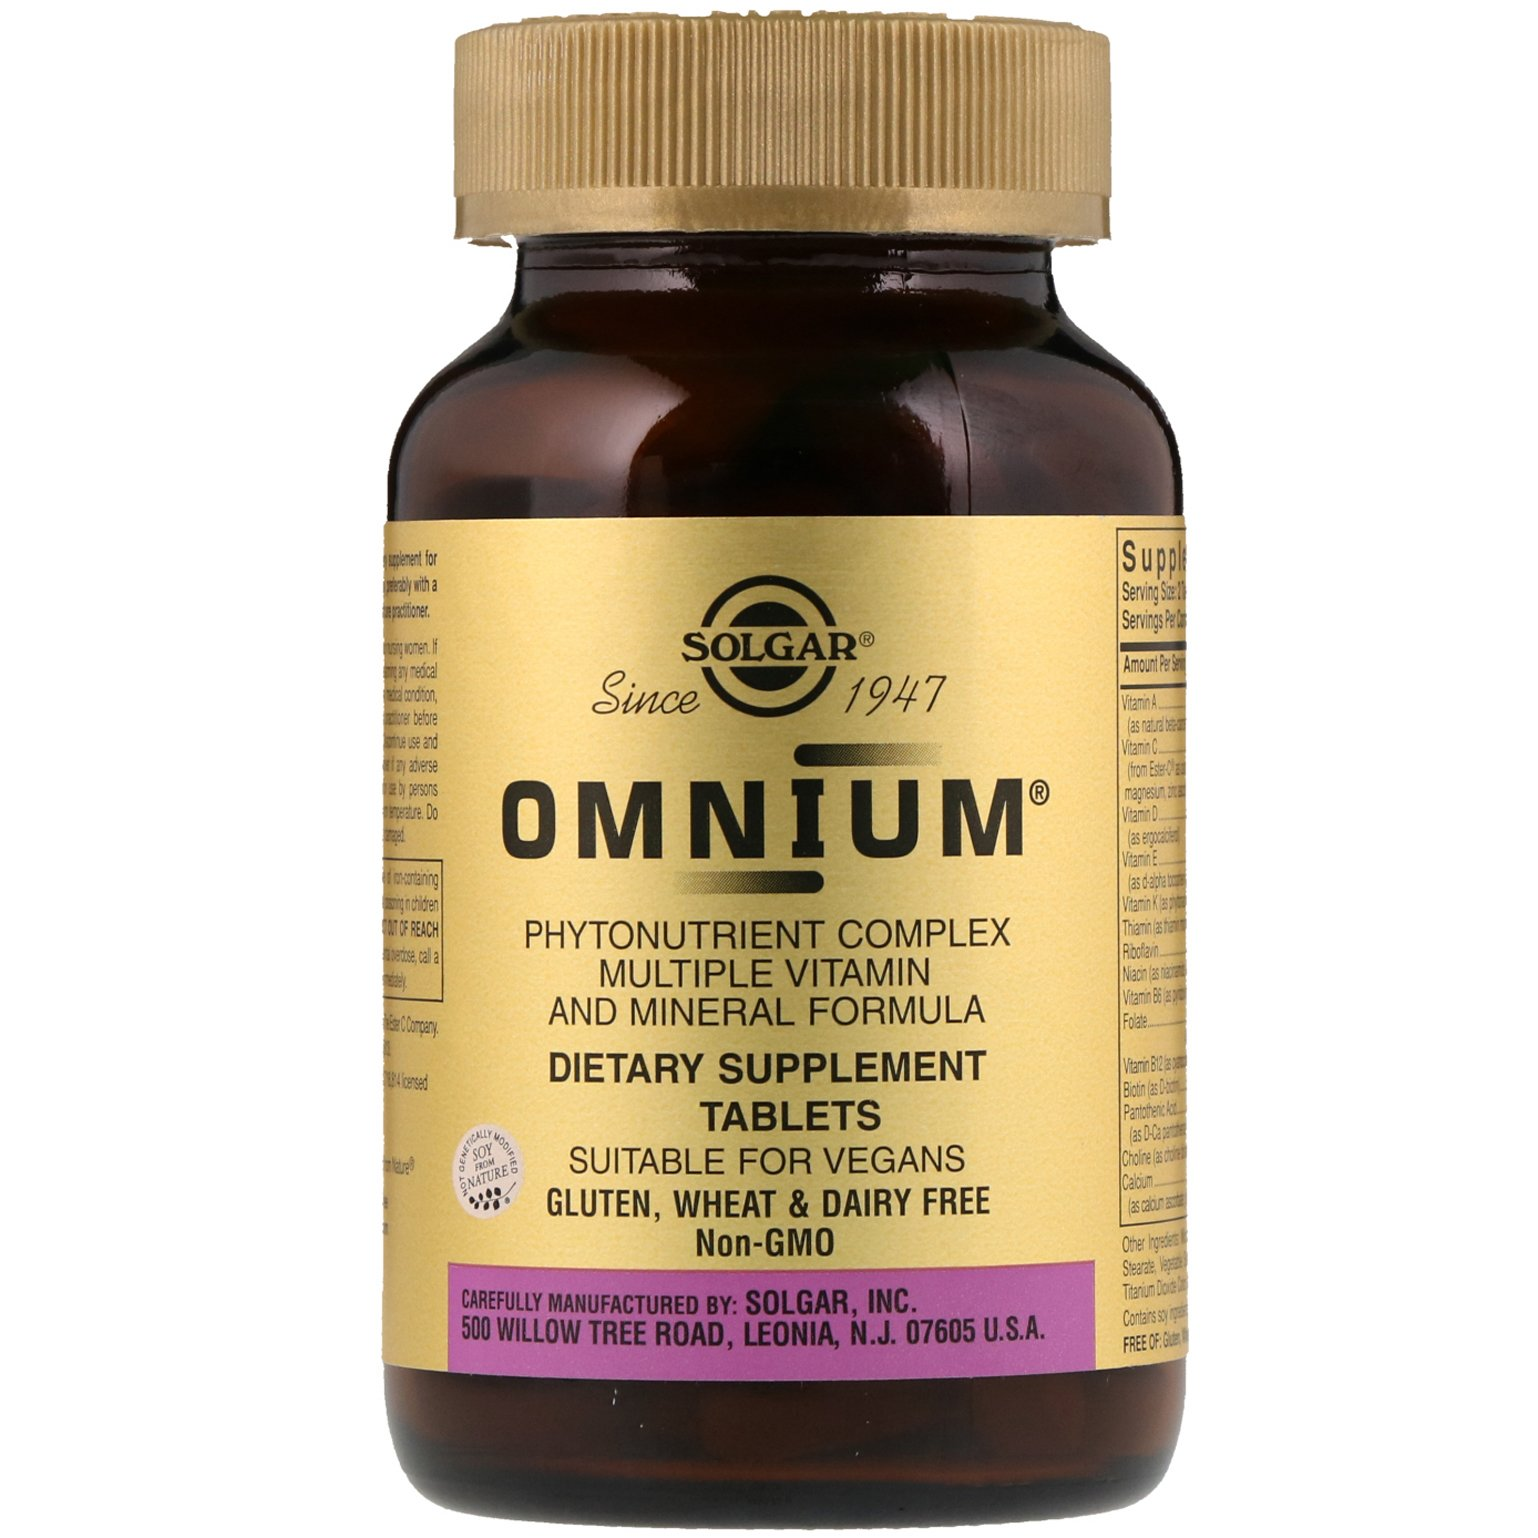 Solgar Omnium Πρωτοποριακή Προηγμένη Φόρμουλα Πολλαπλής Διατροφικής Αξίας – 90 tabs